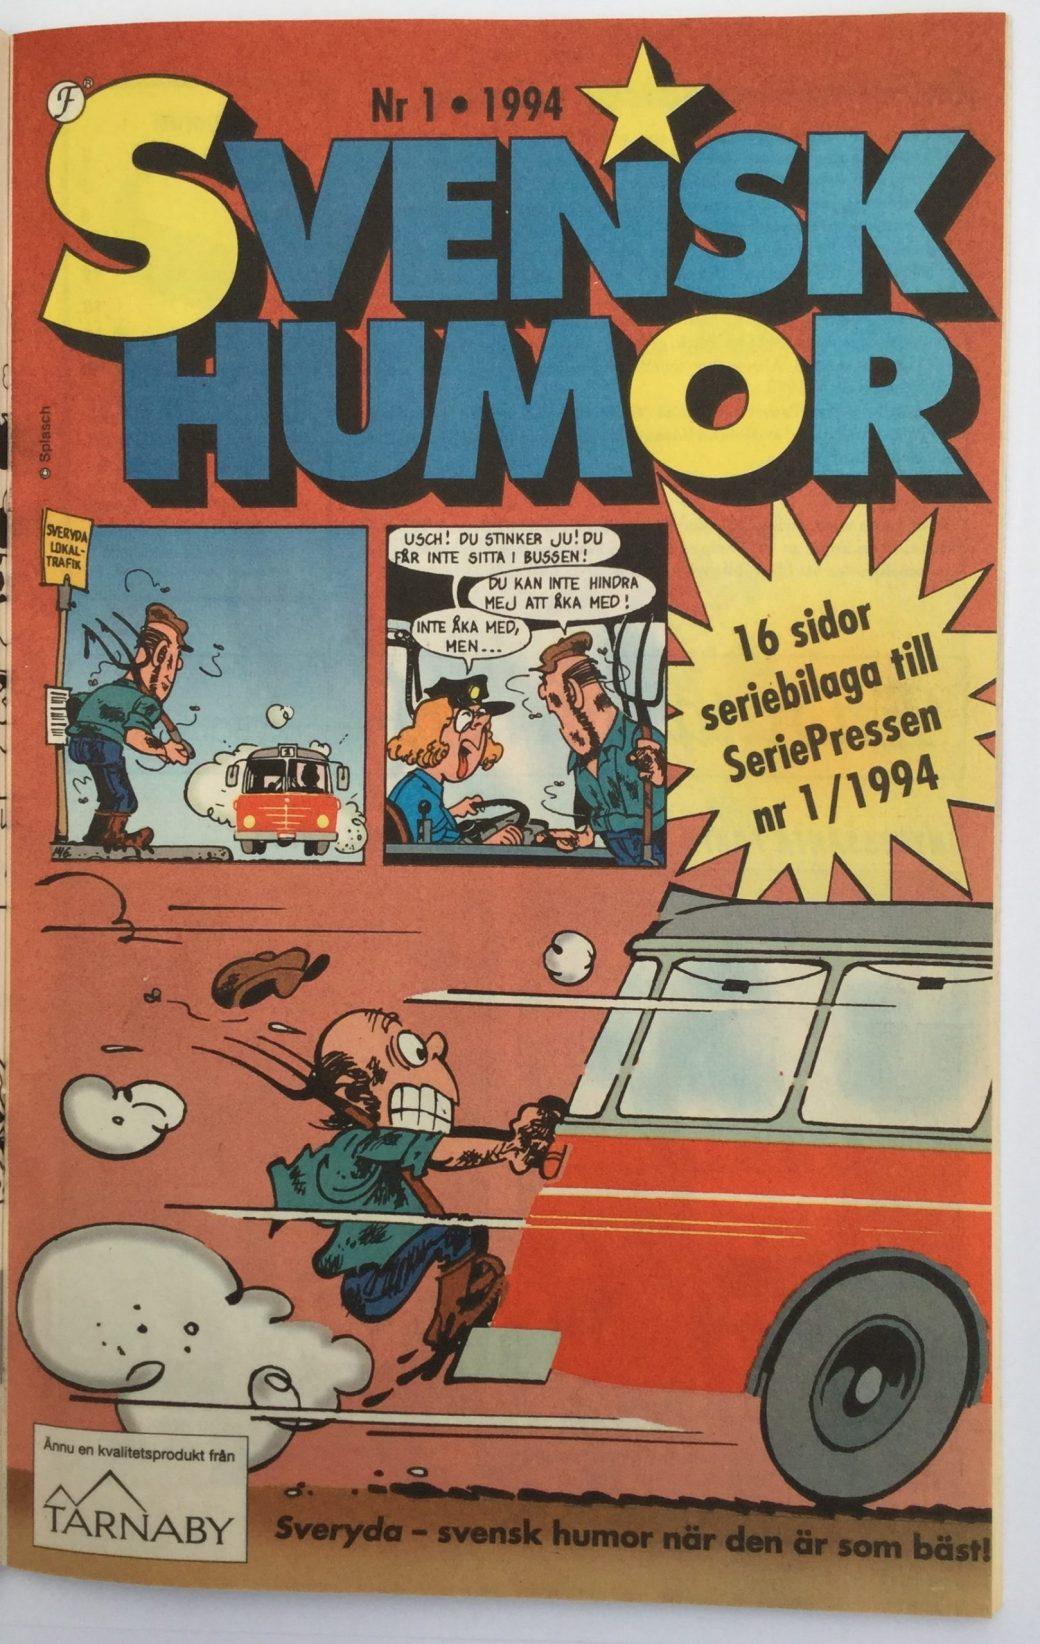 Svensk humor i Seriepressen nr 1, 1994